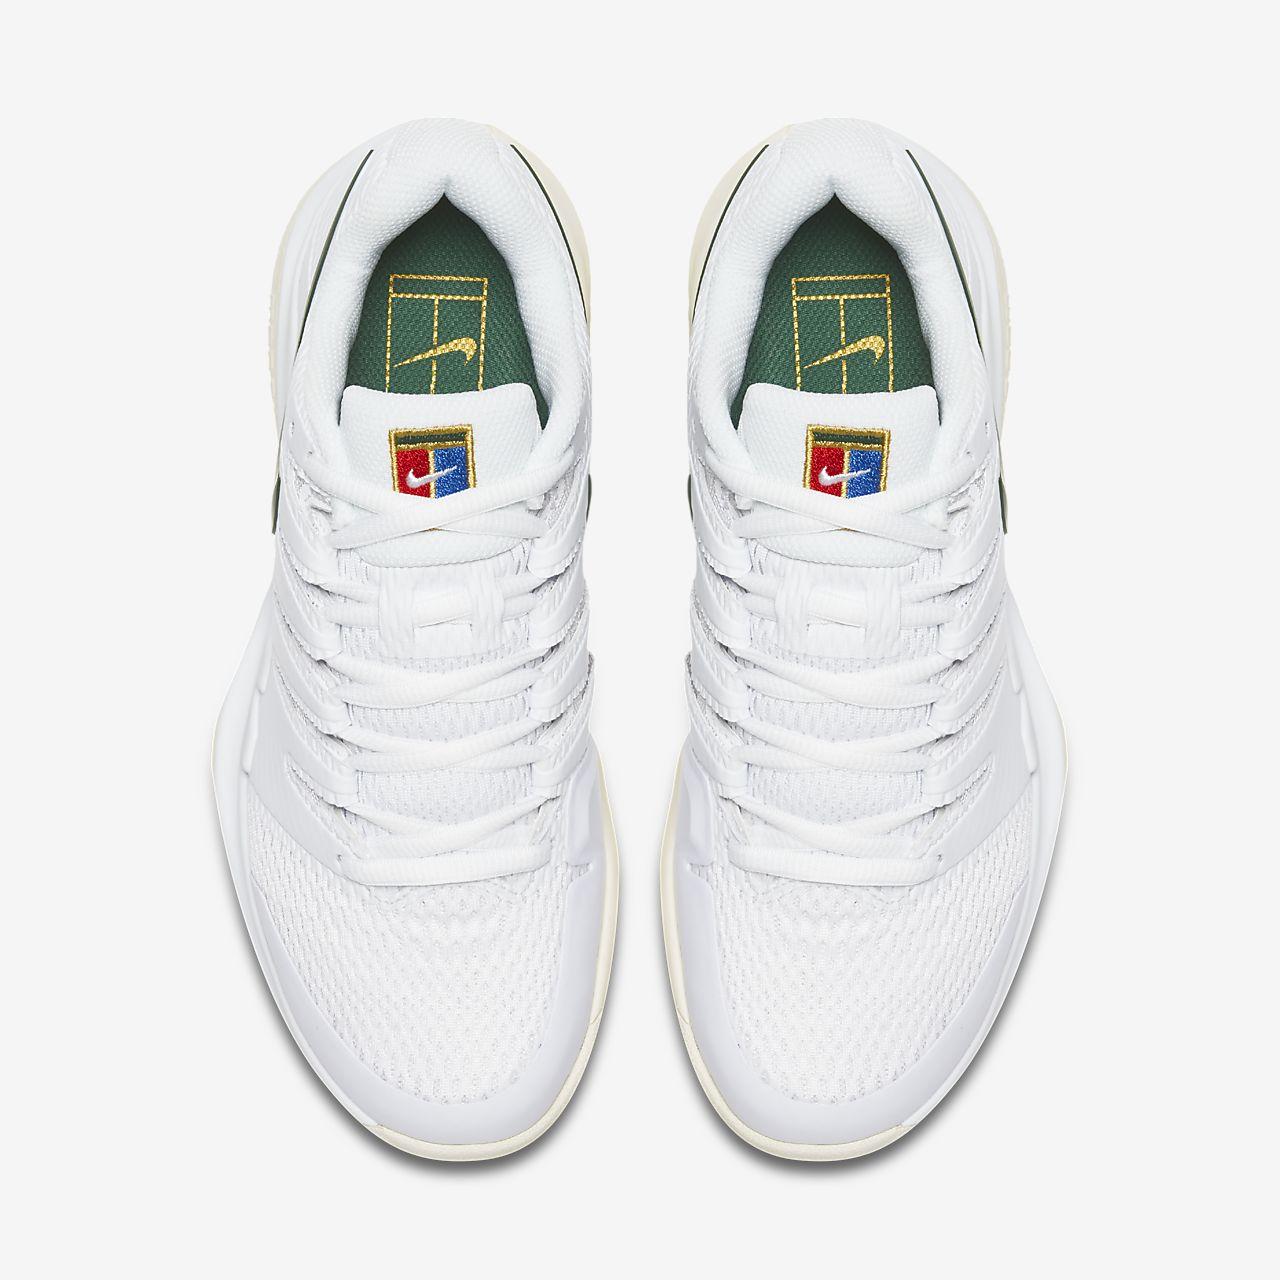 a42e4531fdacd Nike Women s Il Tennis Air Zoom Shoe 10 Carpet Vapor U6Uxqr